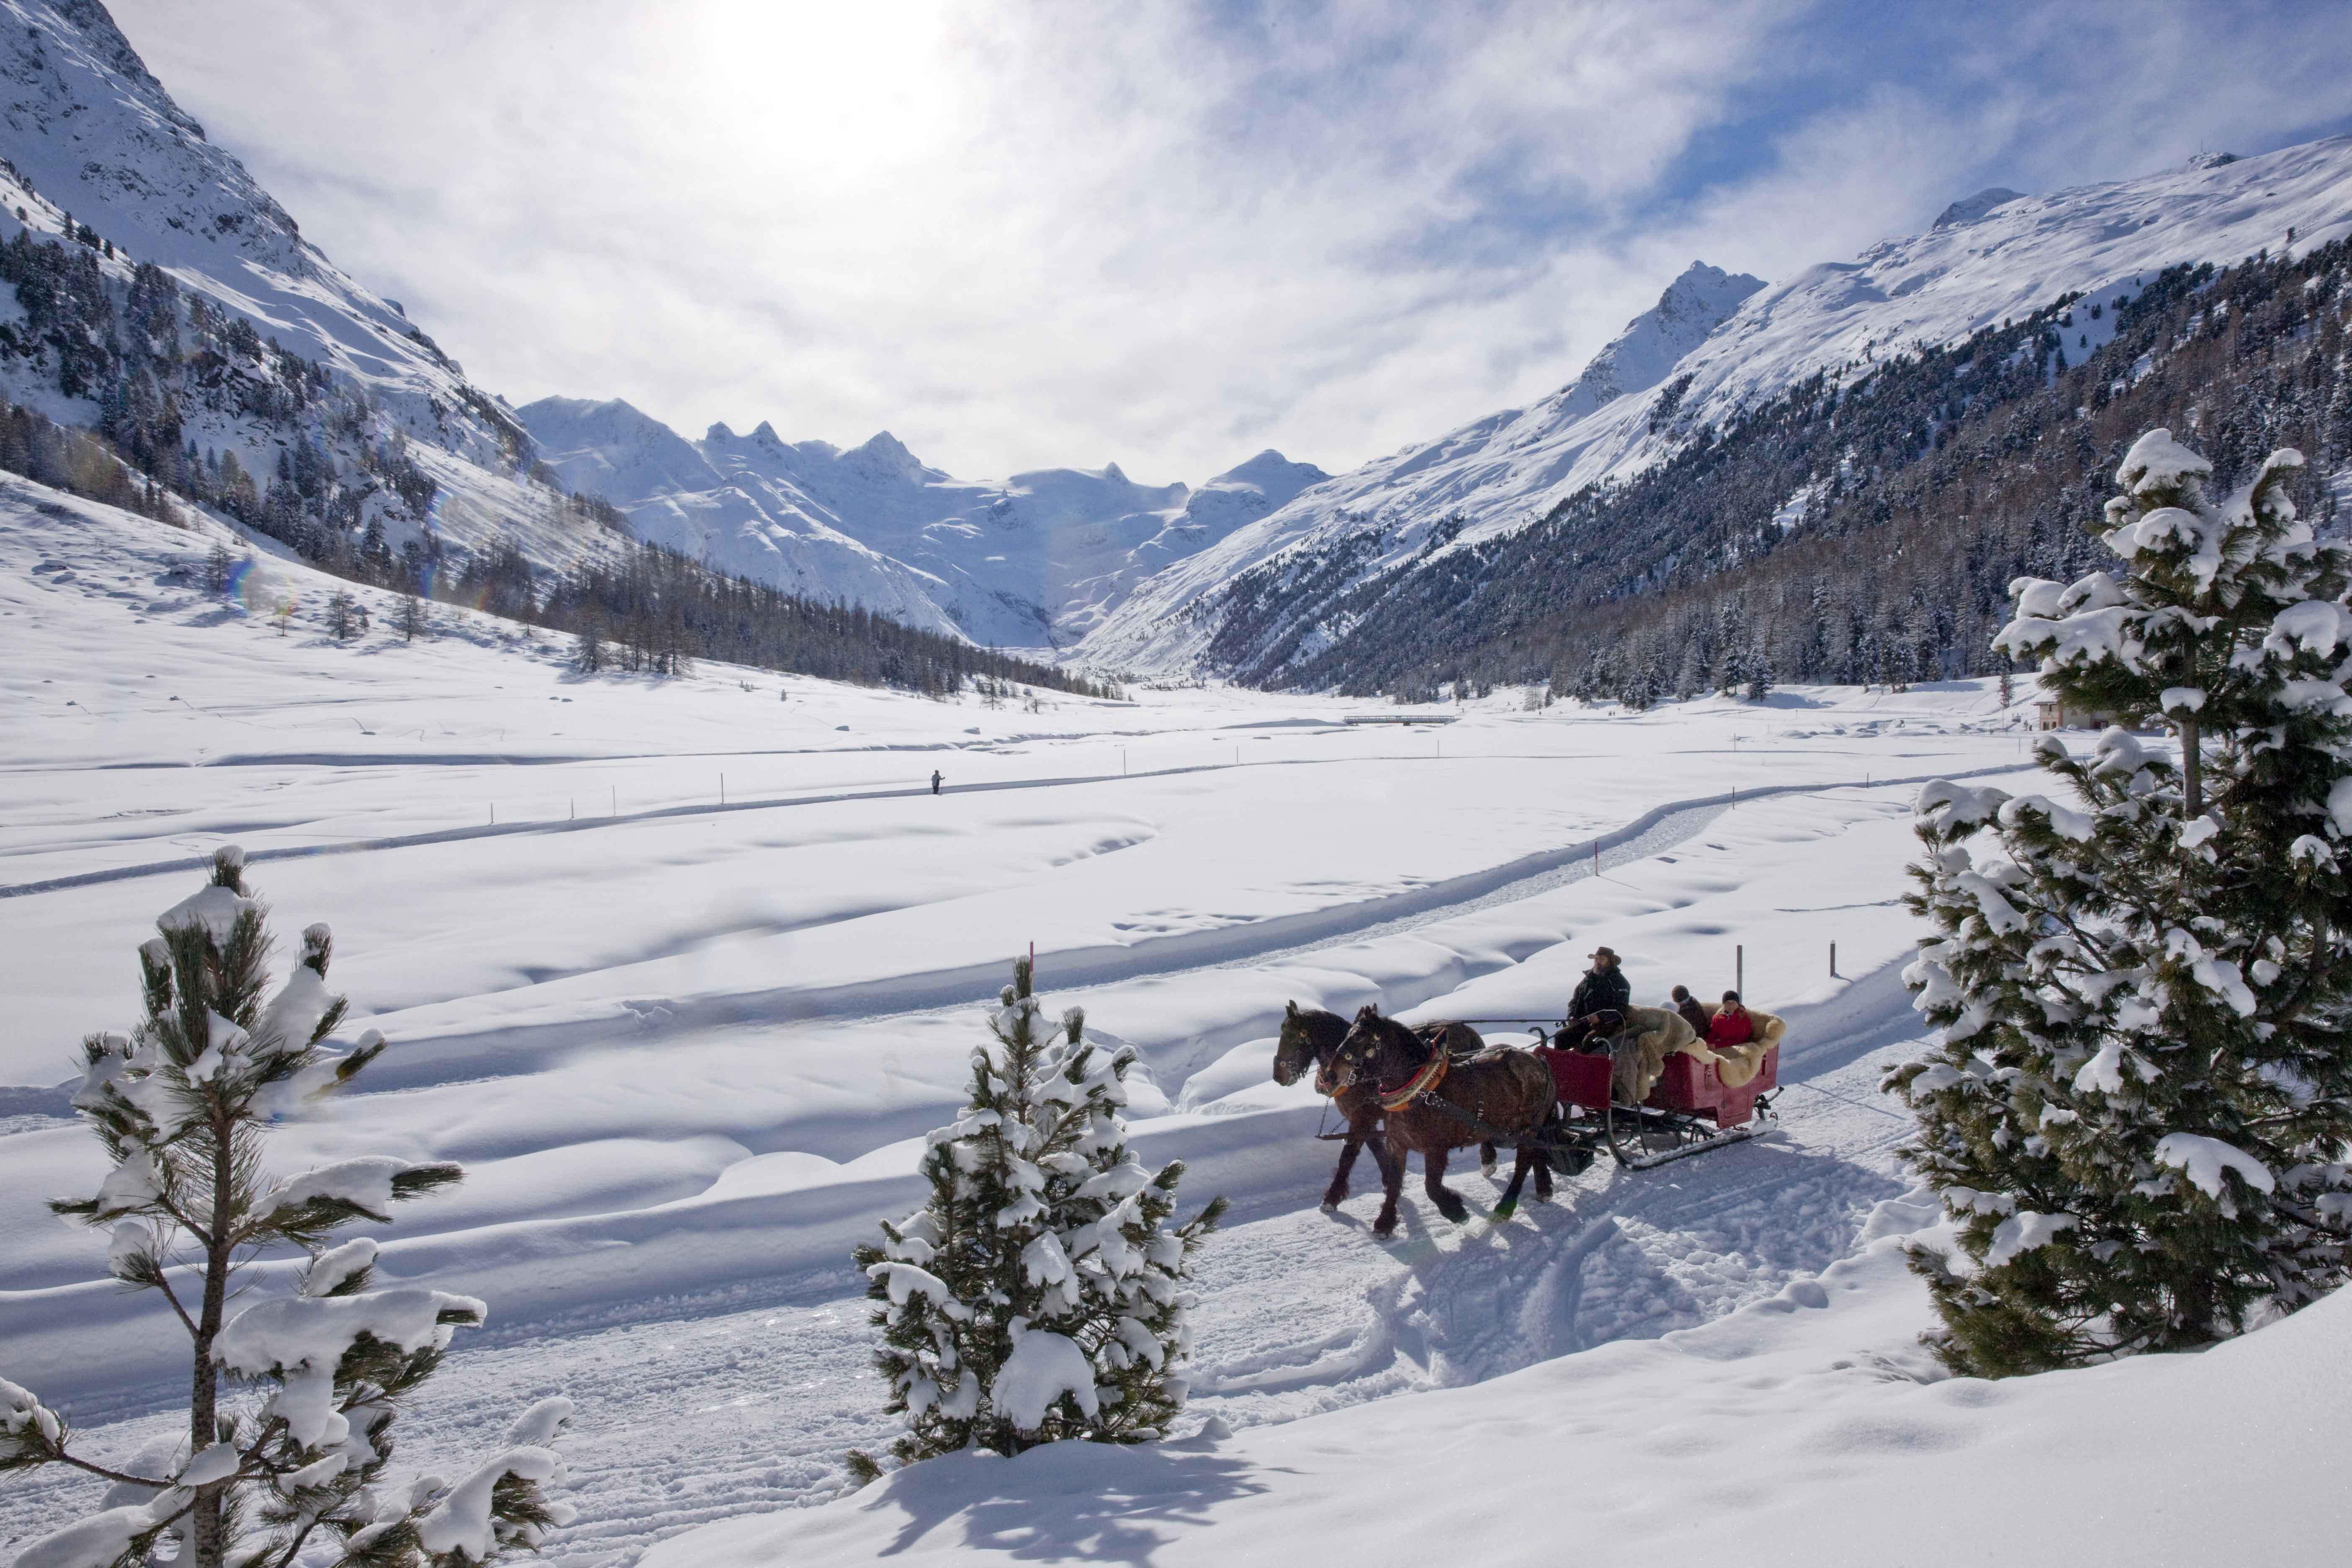 Horse-drawn sleigh ride into the Val Roseg